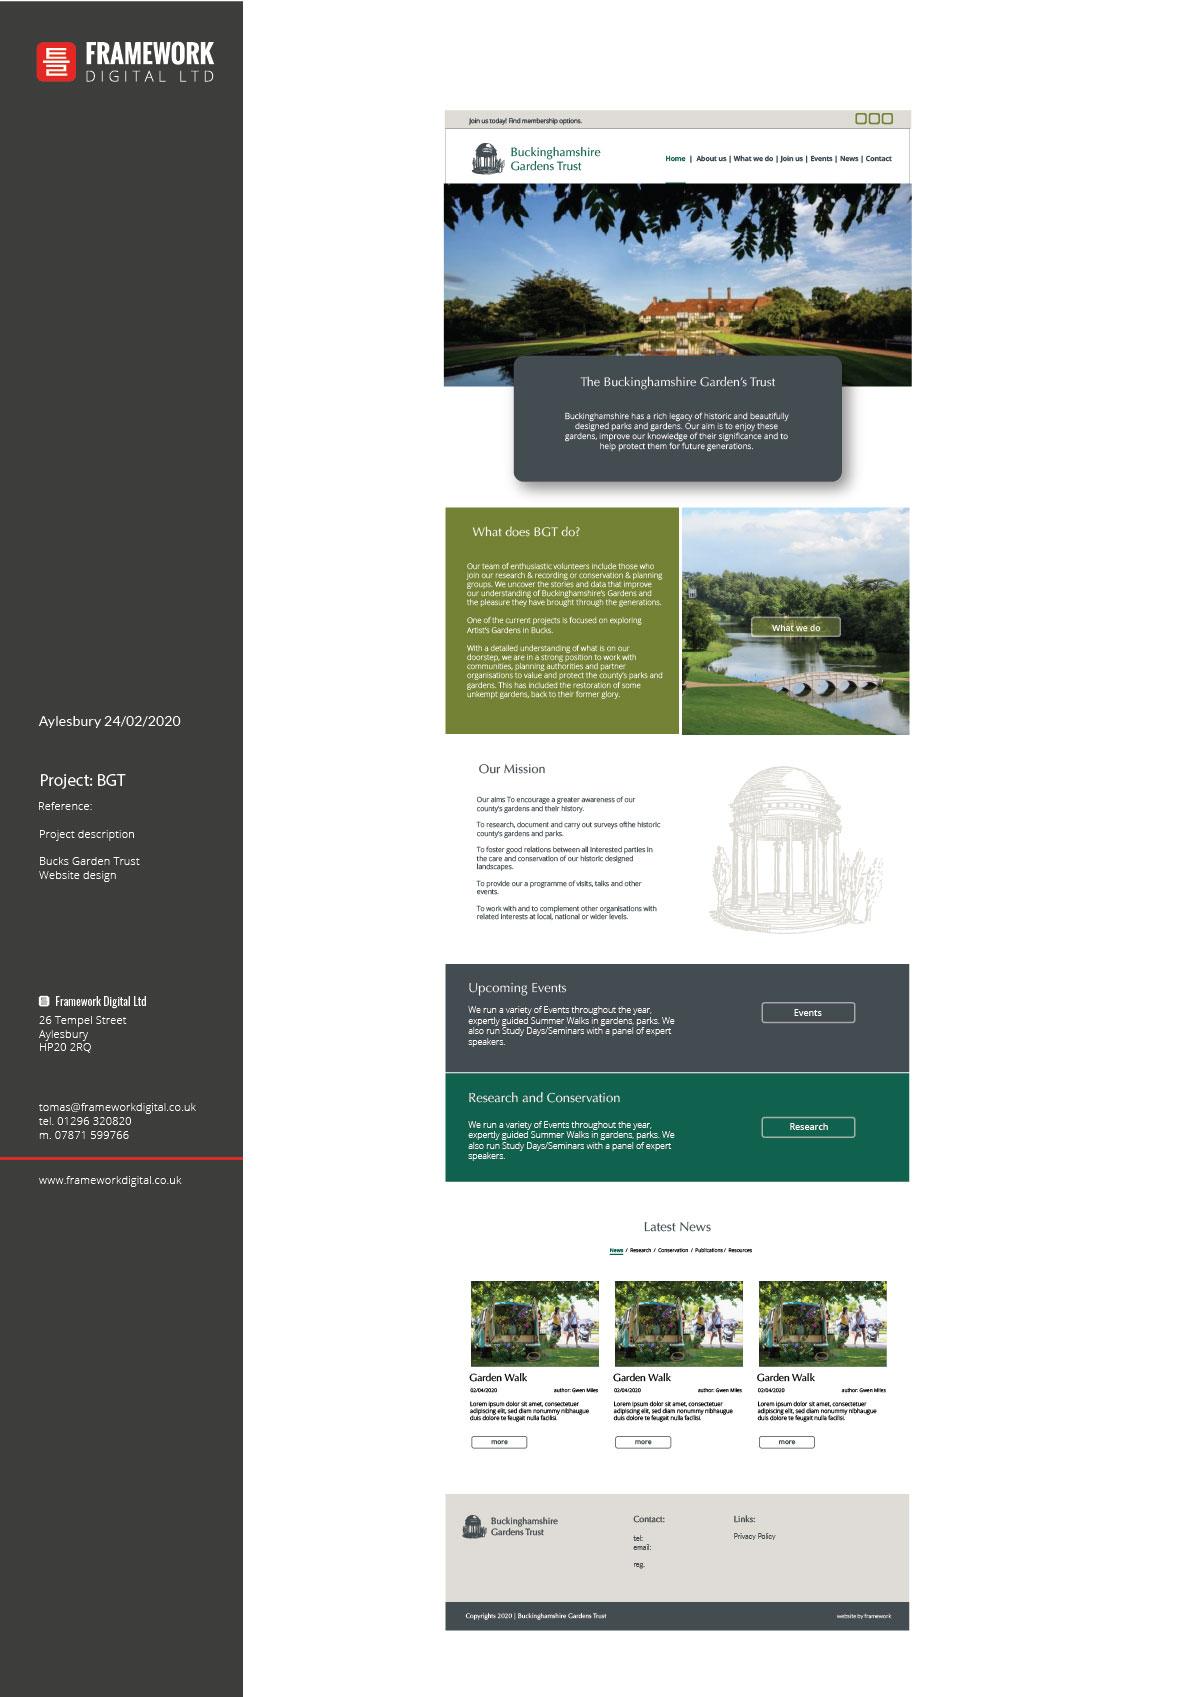 web design - home page for bucks gardens trust